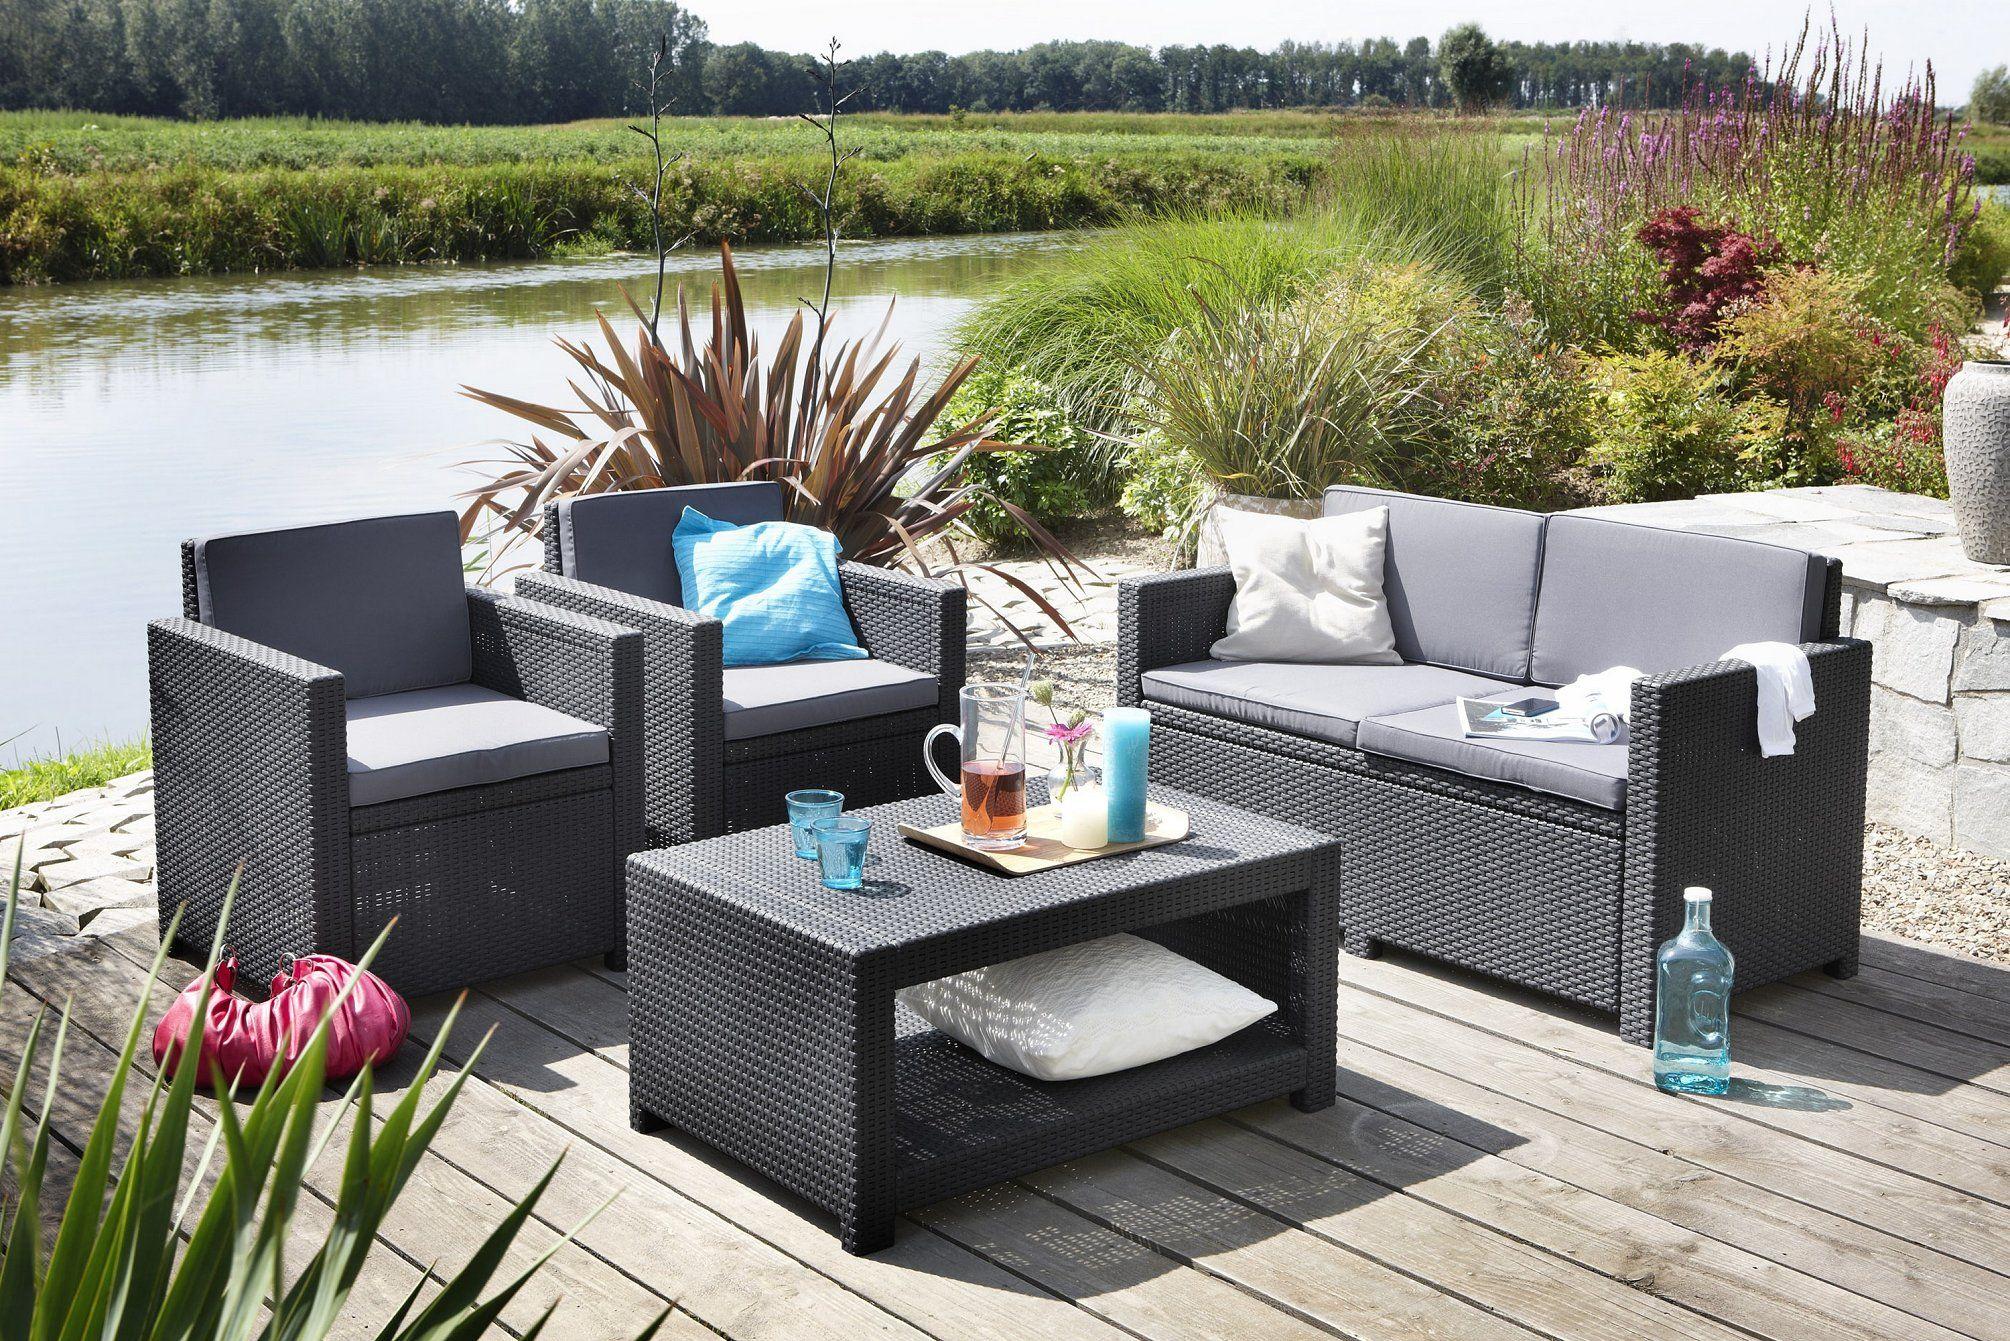 Castell Soffgrupp In 2020 | Outdoor Furniture Sets, Garden ... avec Salon De Jardin En Promotion